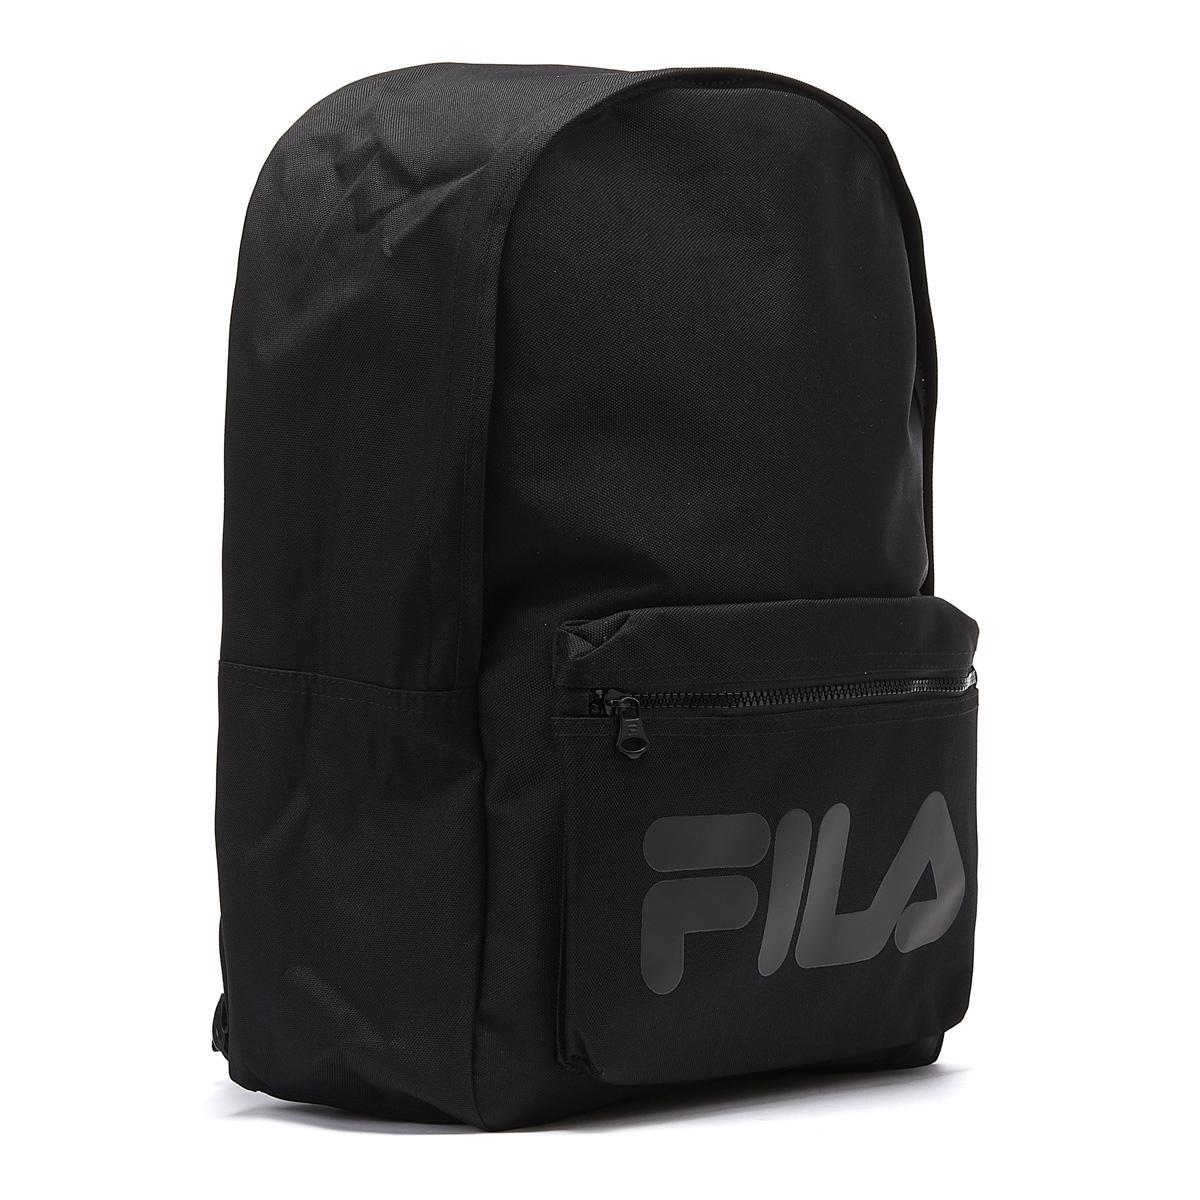 b112509a54 Lyst - Fila Verdon Black Backpack in Black for Men